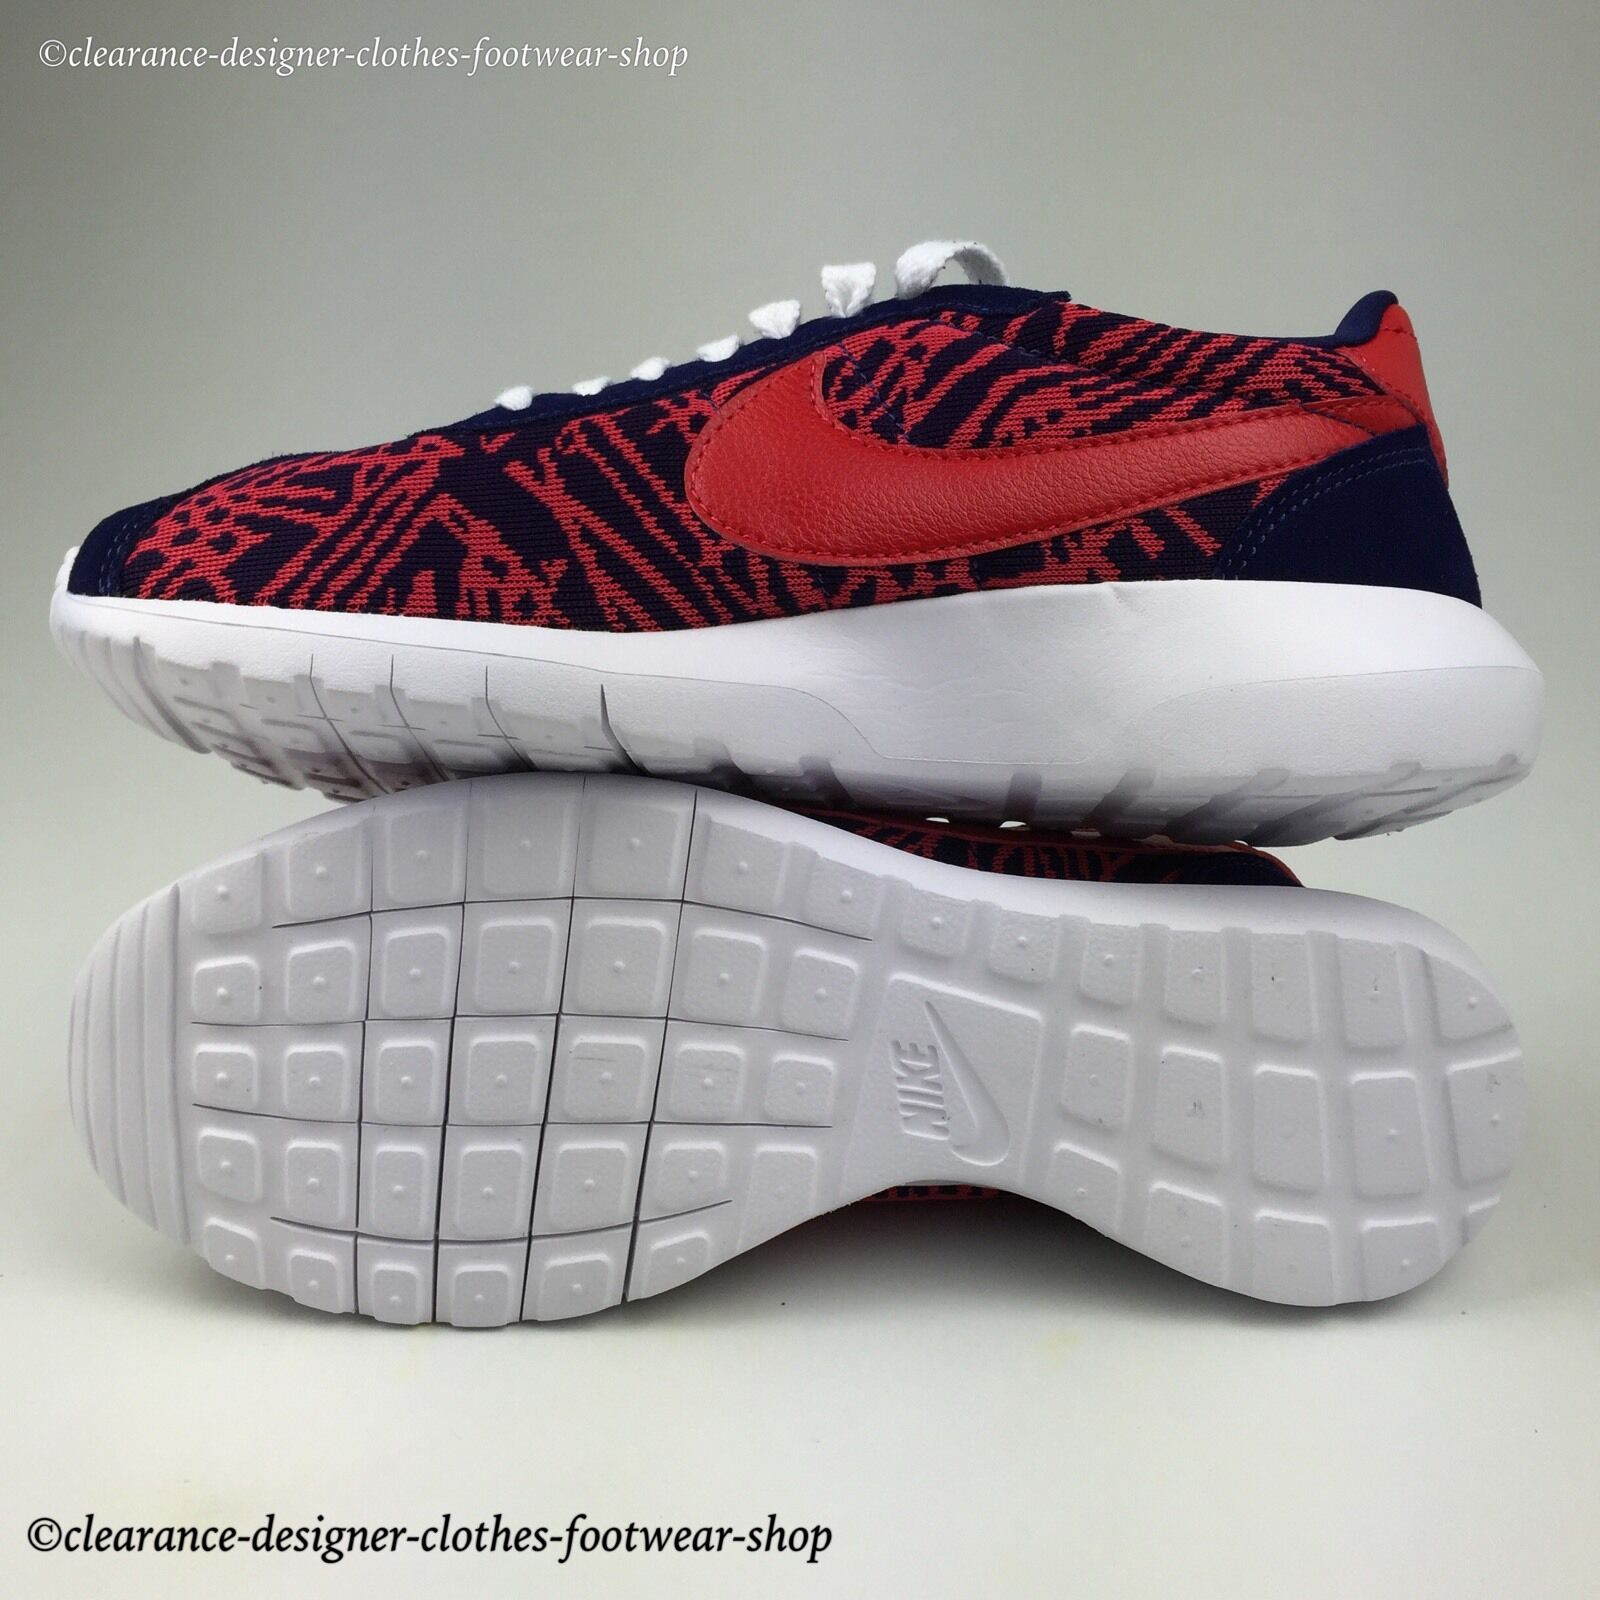 Nike roshe LD-1000 knit jacquard baskets pour femme run chaussures uk 5.5 rrp 130